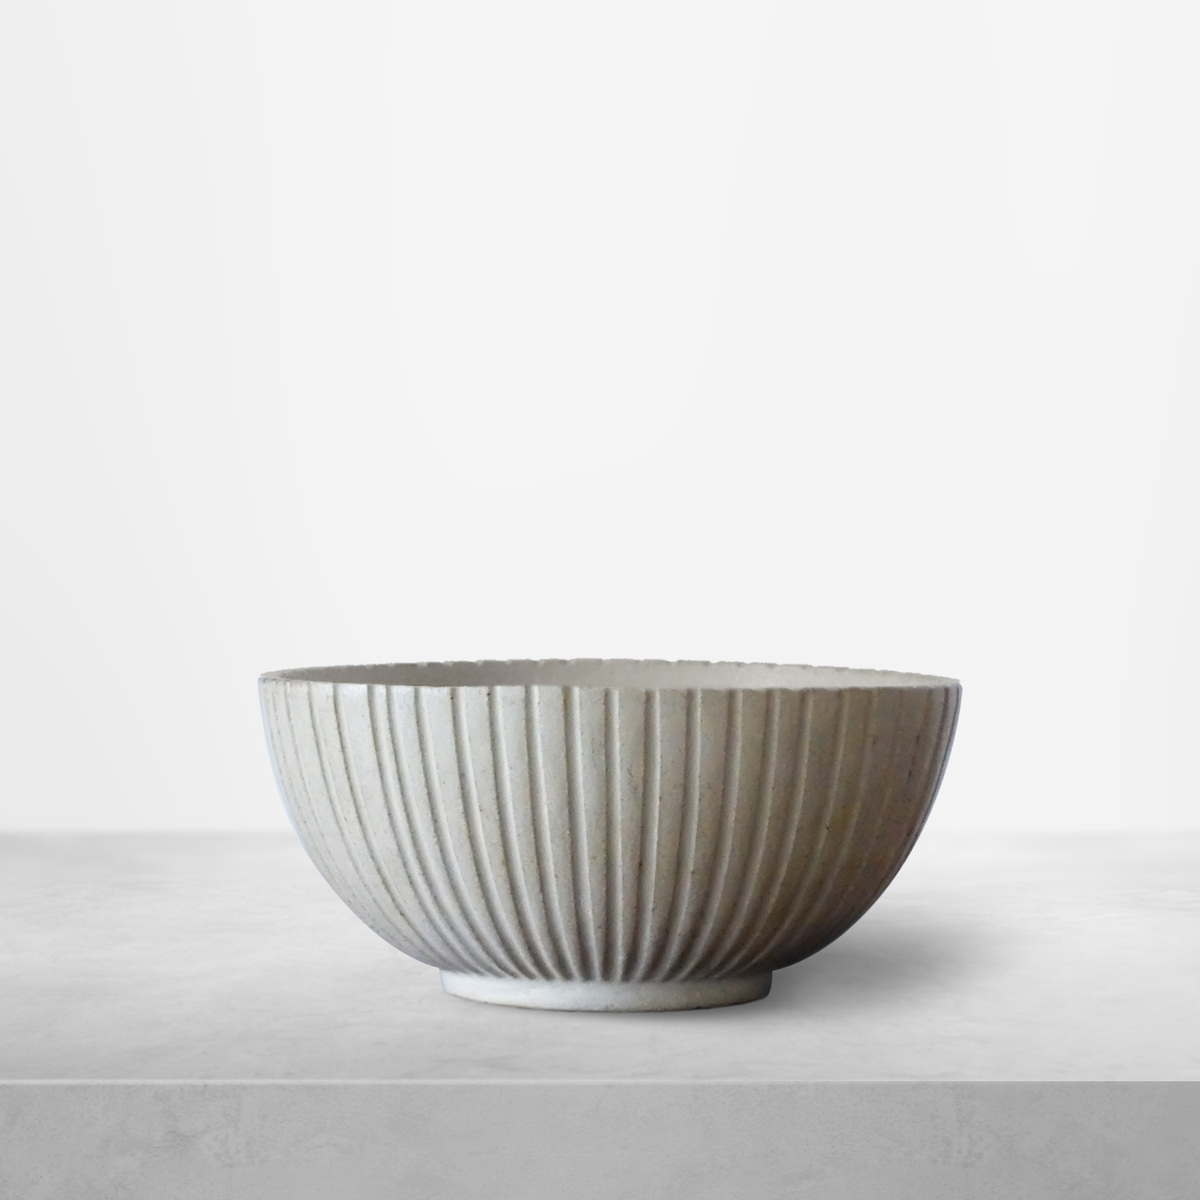 Arne Bang for Royal Copenhagen, Scandinavian Ribbed cream-colored Ceramic Bowl, 1940s